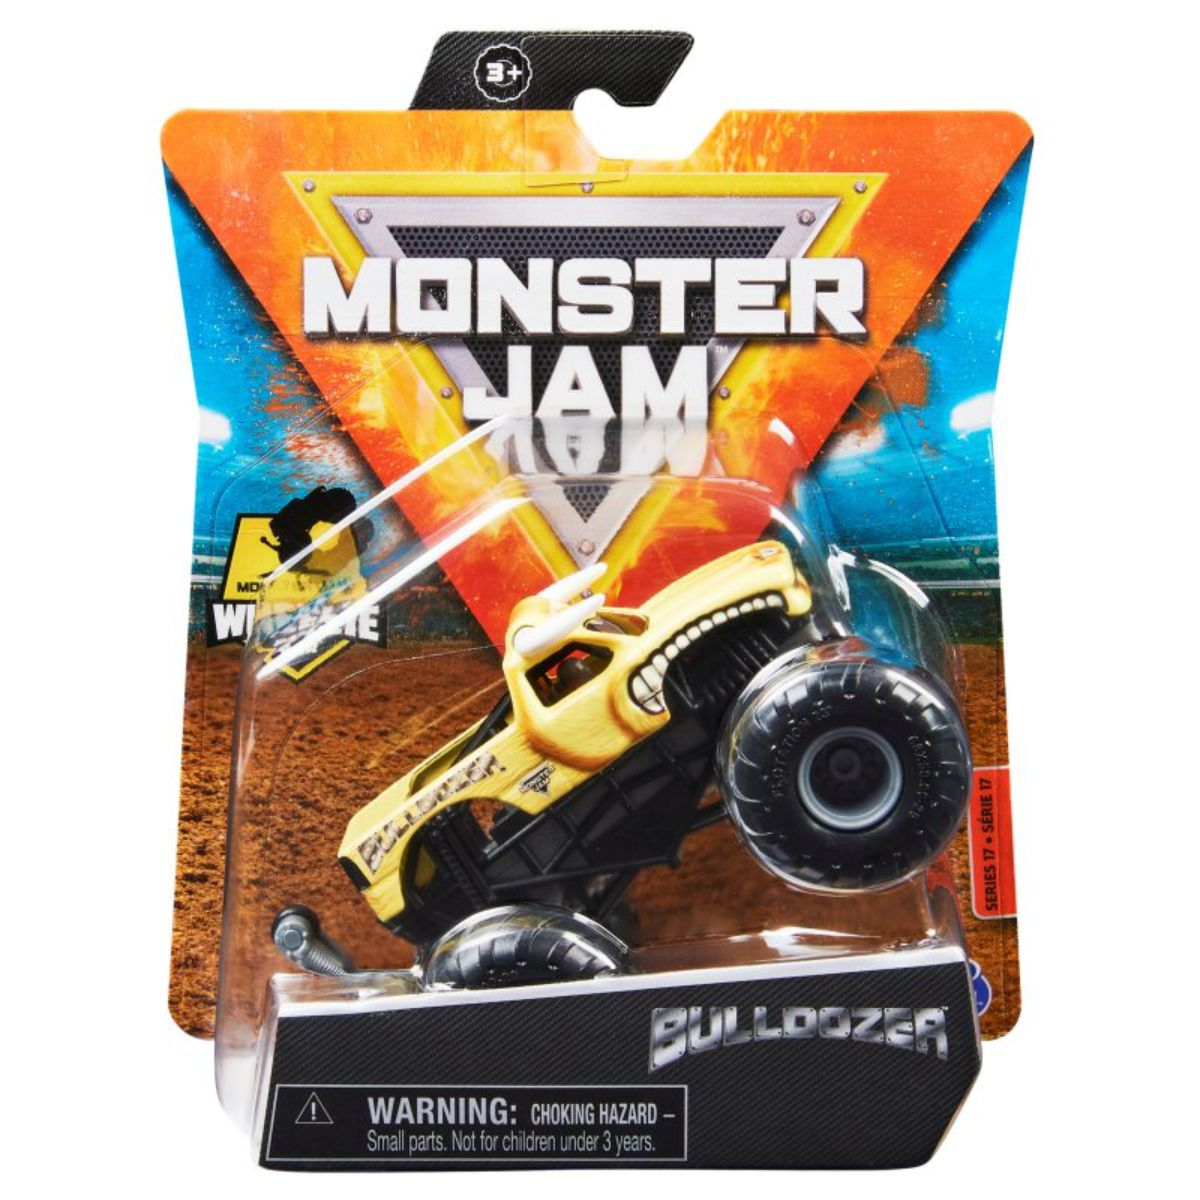 Masinuta Monster Jam, Scara 1:64, Buldozer, 20130581